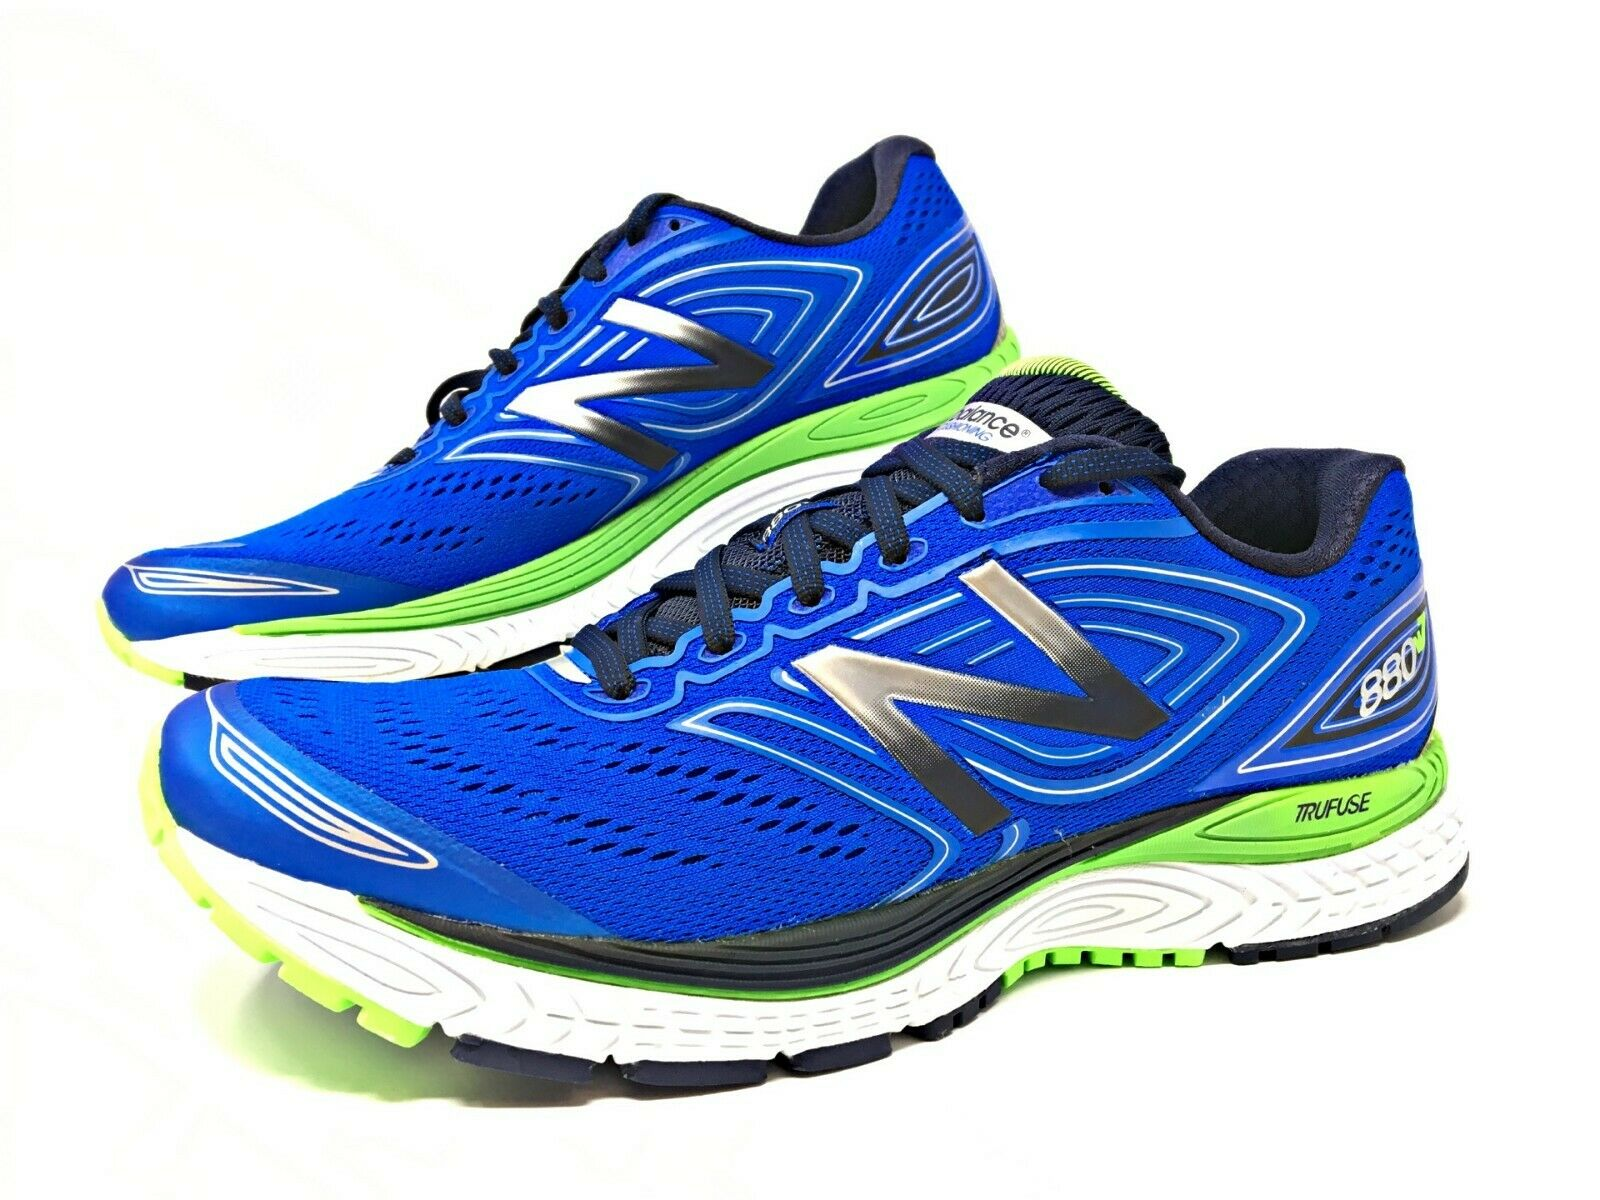 New Balance Men's 880v7 bluee Green Mens Running Running Running shoes Size US 11 Medium (M880BW7) 710667